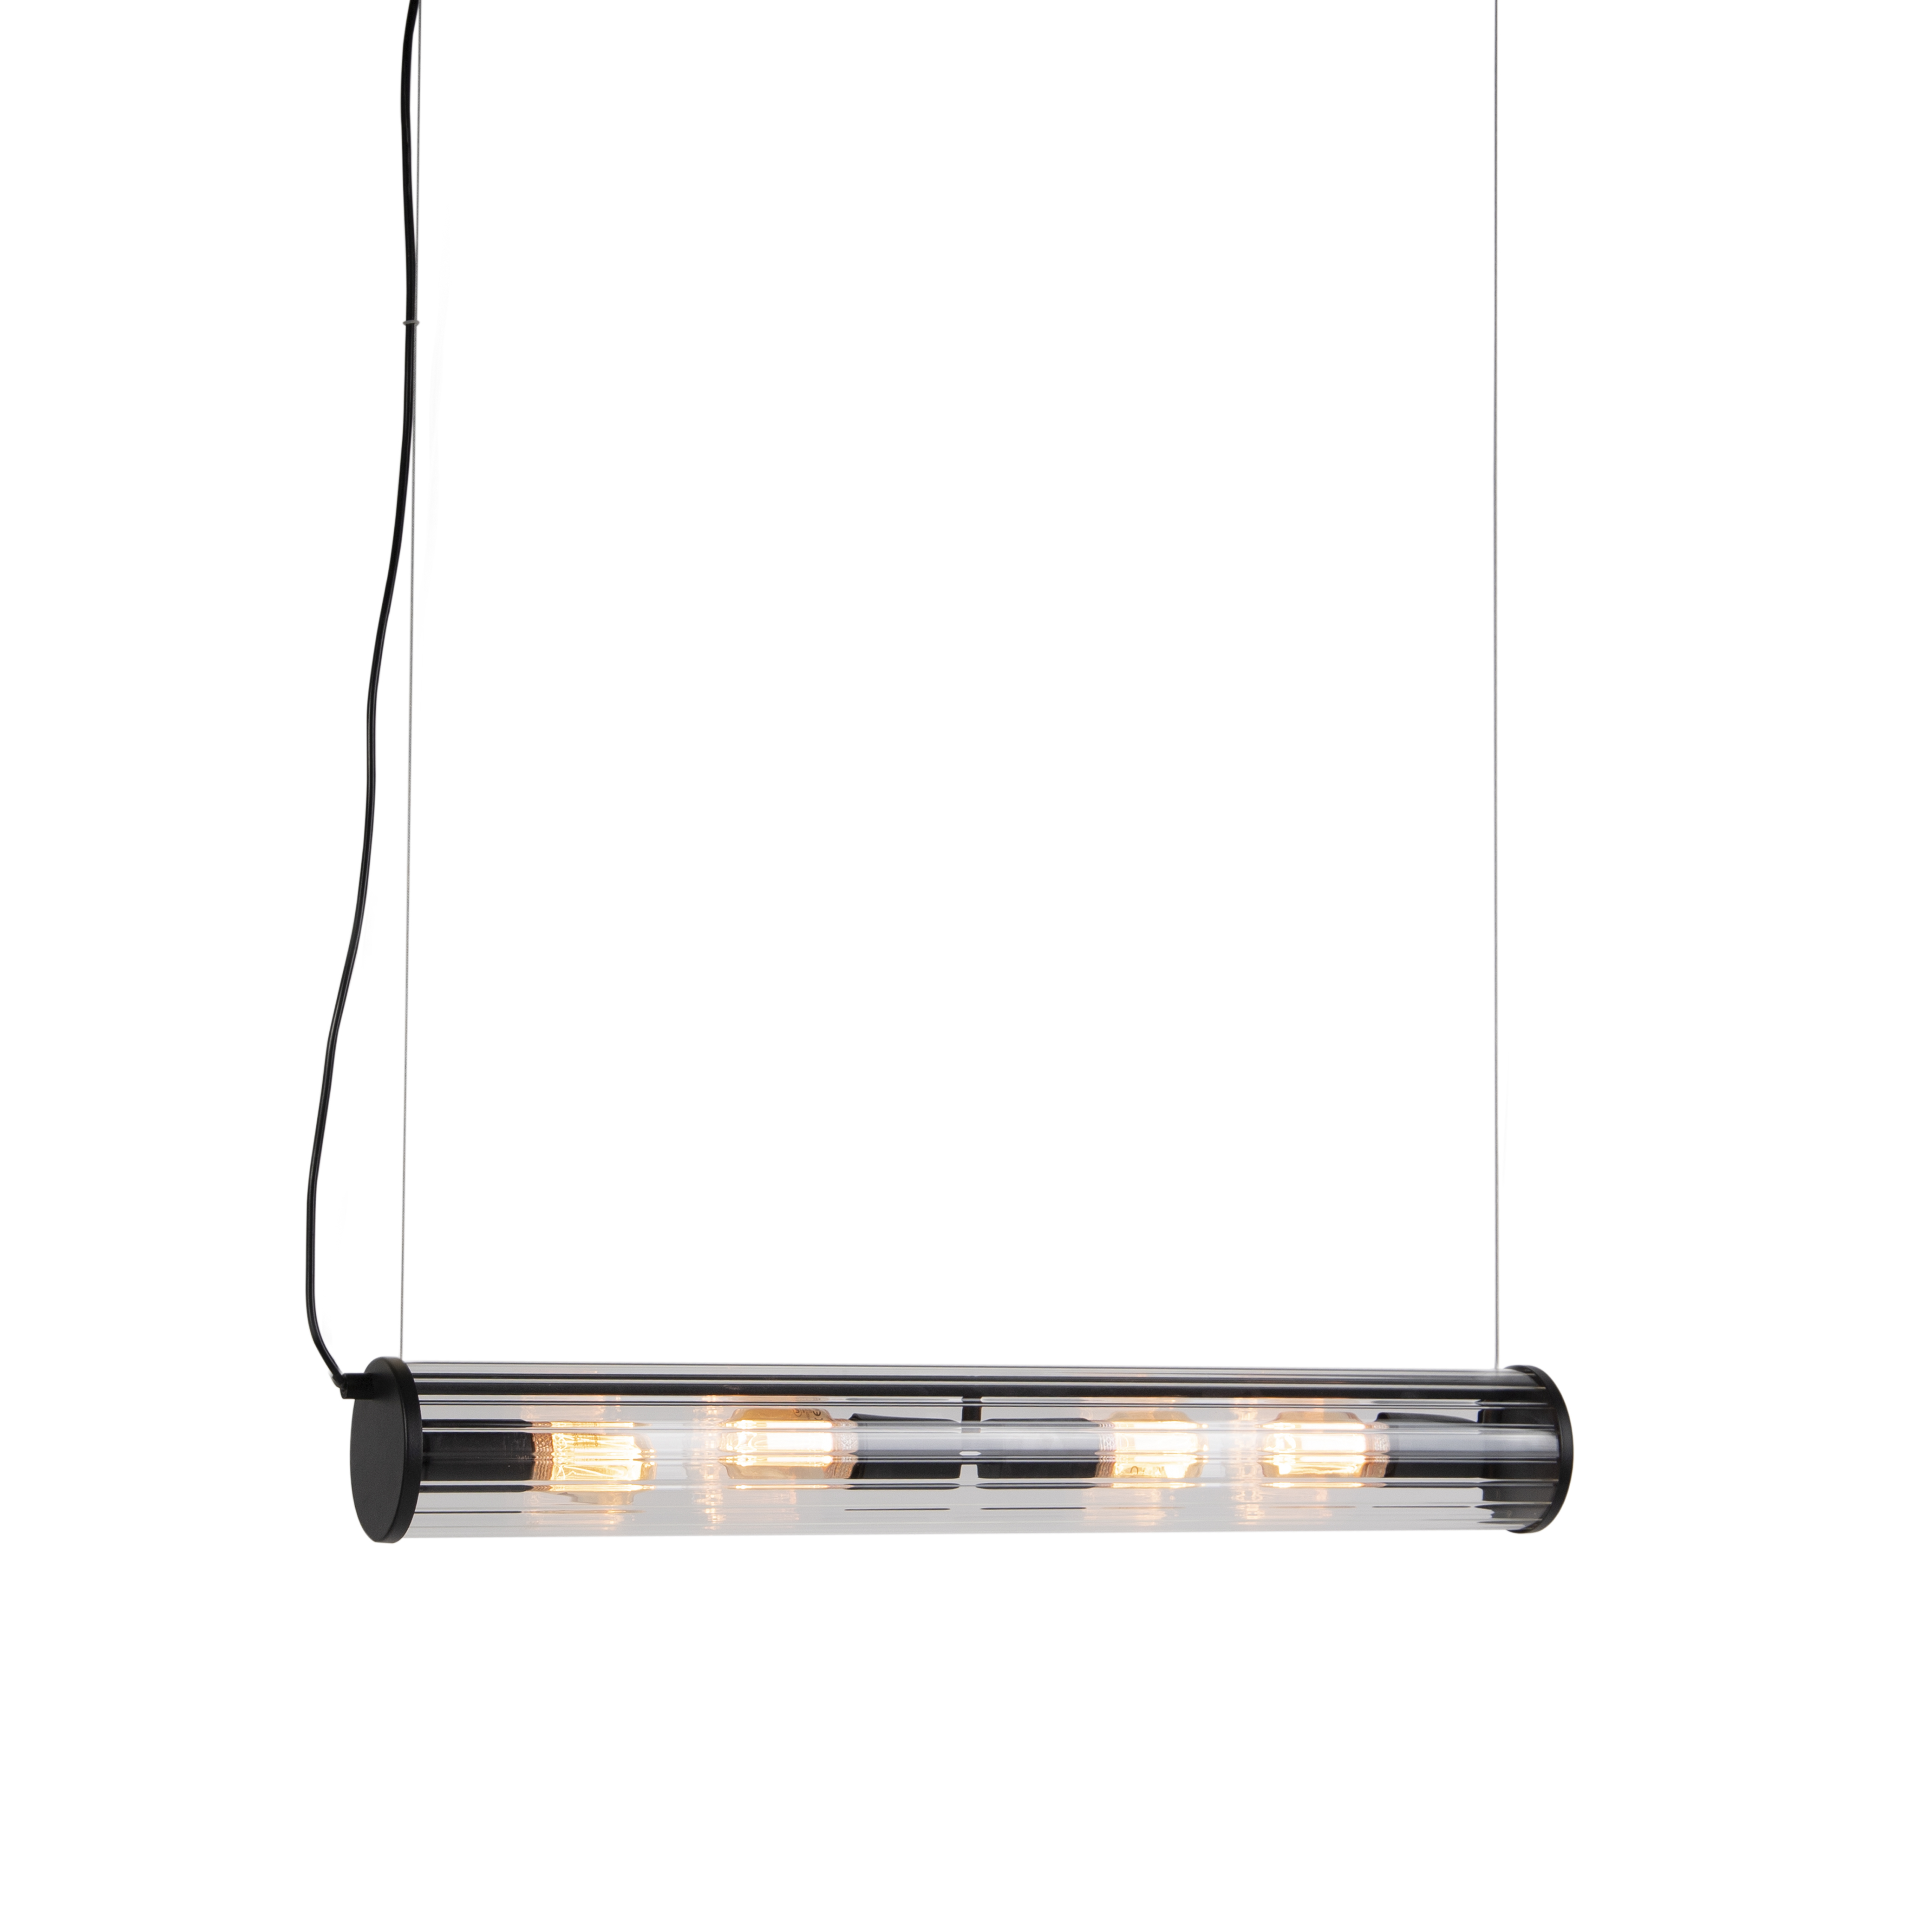 Vintage hanglamp zwart 4-lichts met geribbeld glas - Costilla